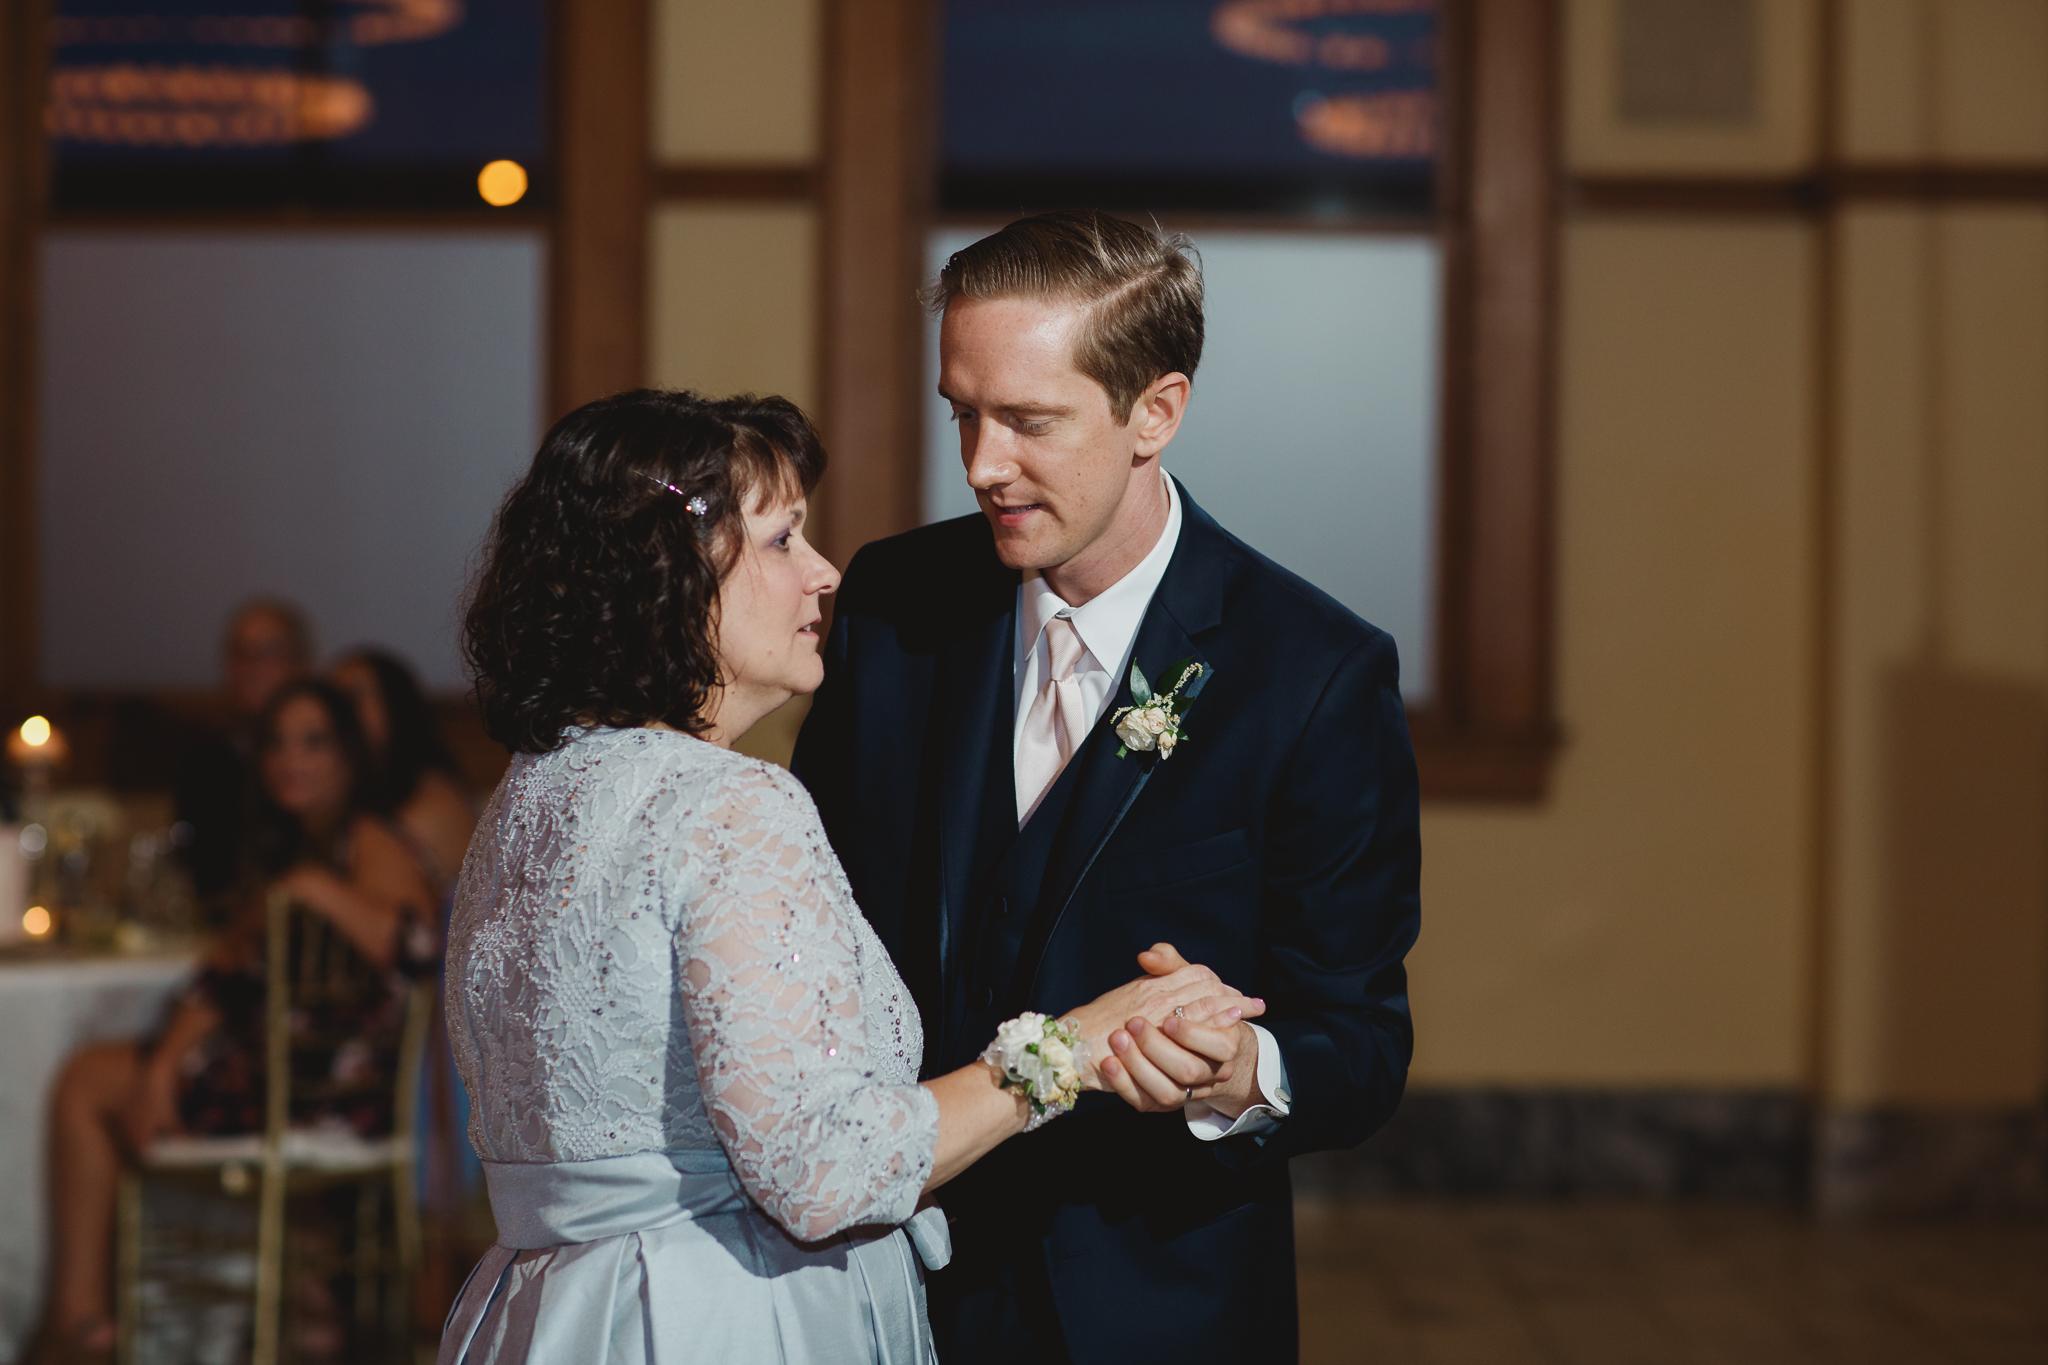 Michael and Kelly - the ashton depot - wedding DFW - wedding photographer- elizalde photography (116 of 150).jpg